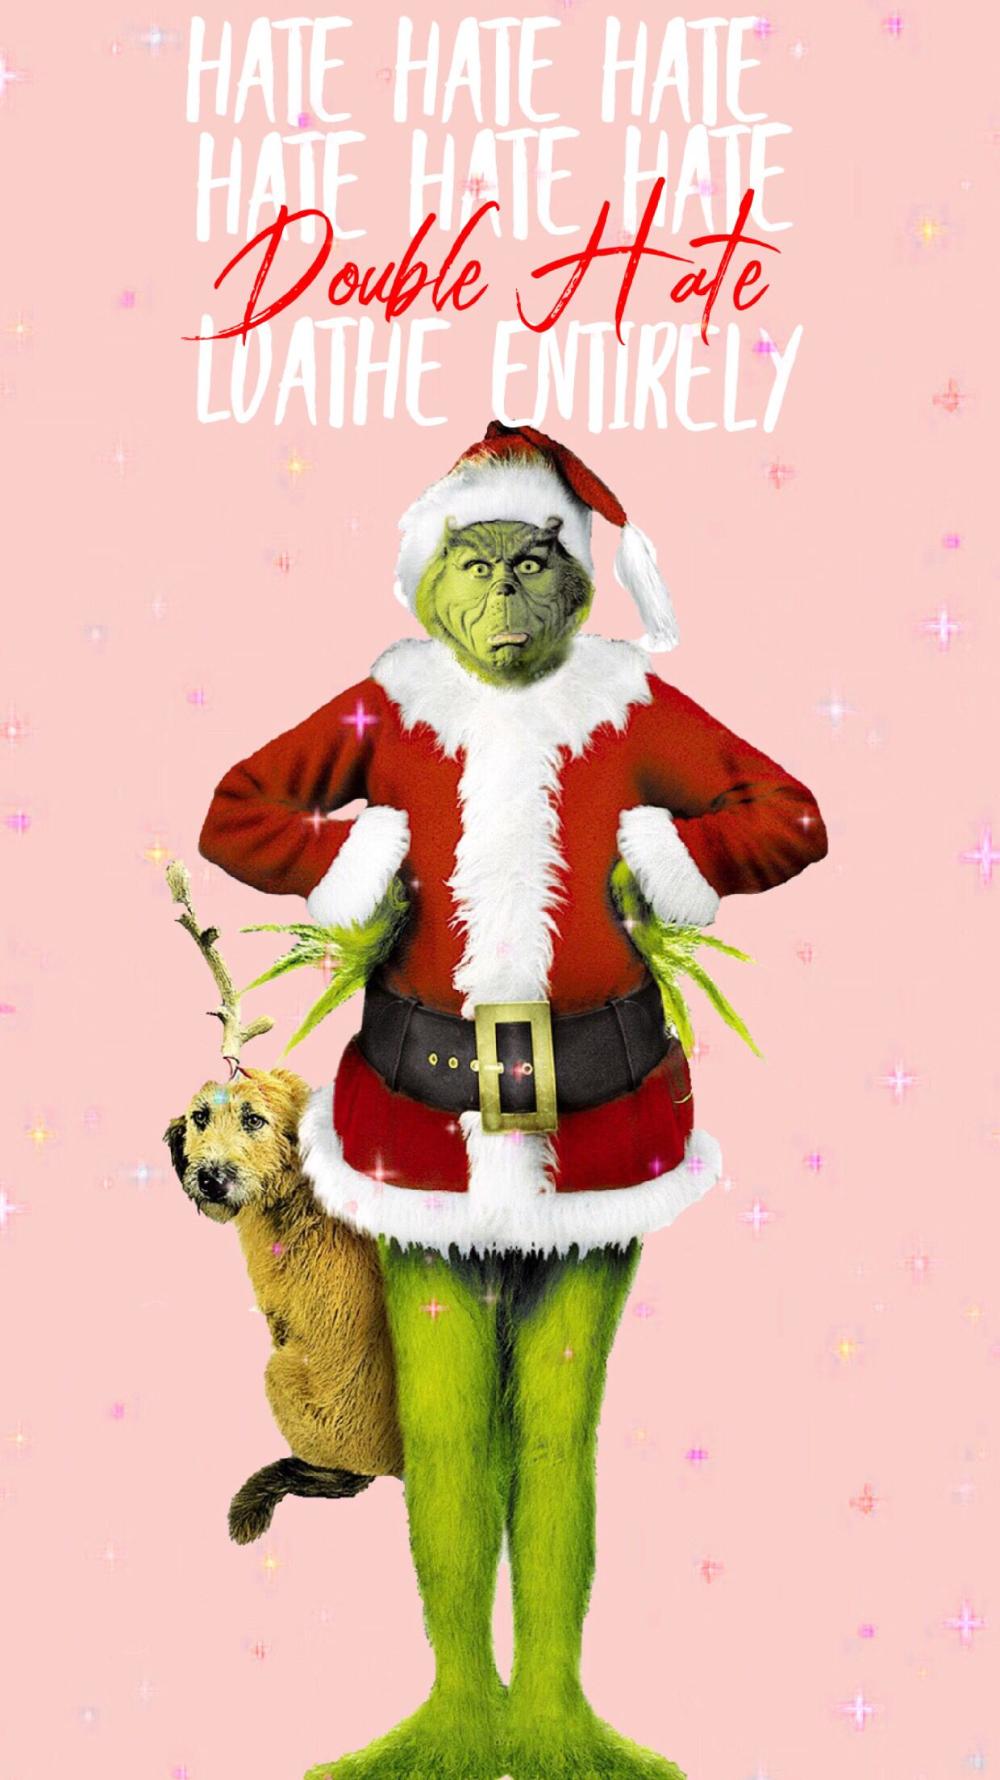 New Santa Animated Merry Christmas Hd Wallpaper Wallpaper With Animated Christmas Wallpaper Christmas Toys Animated Christmas